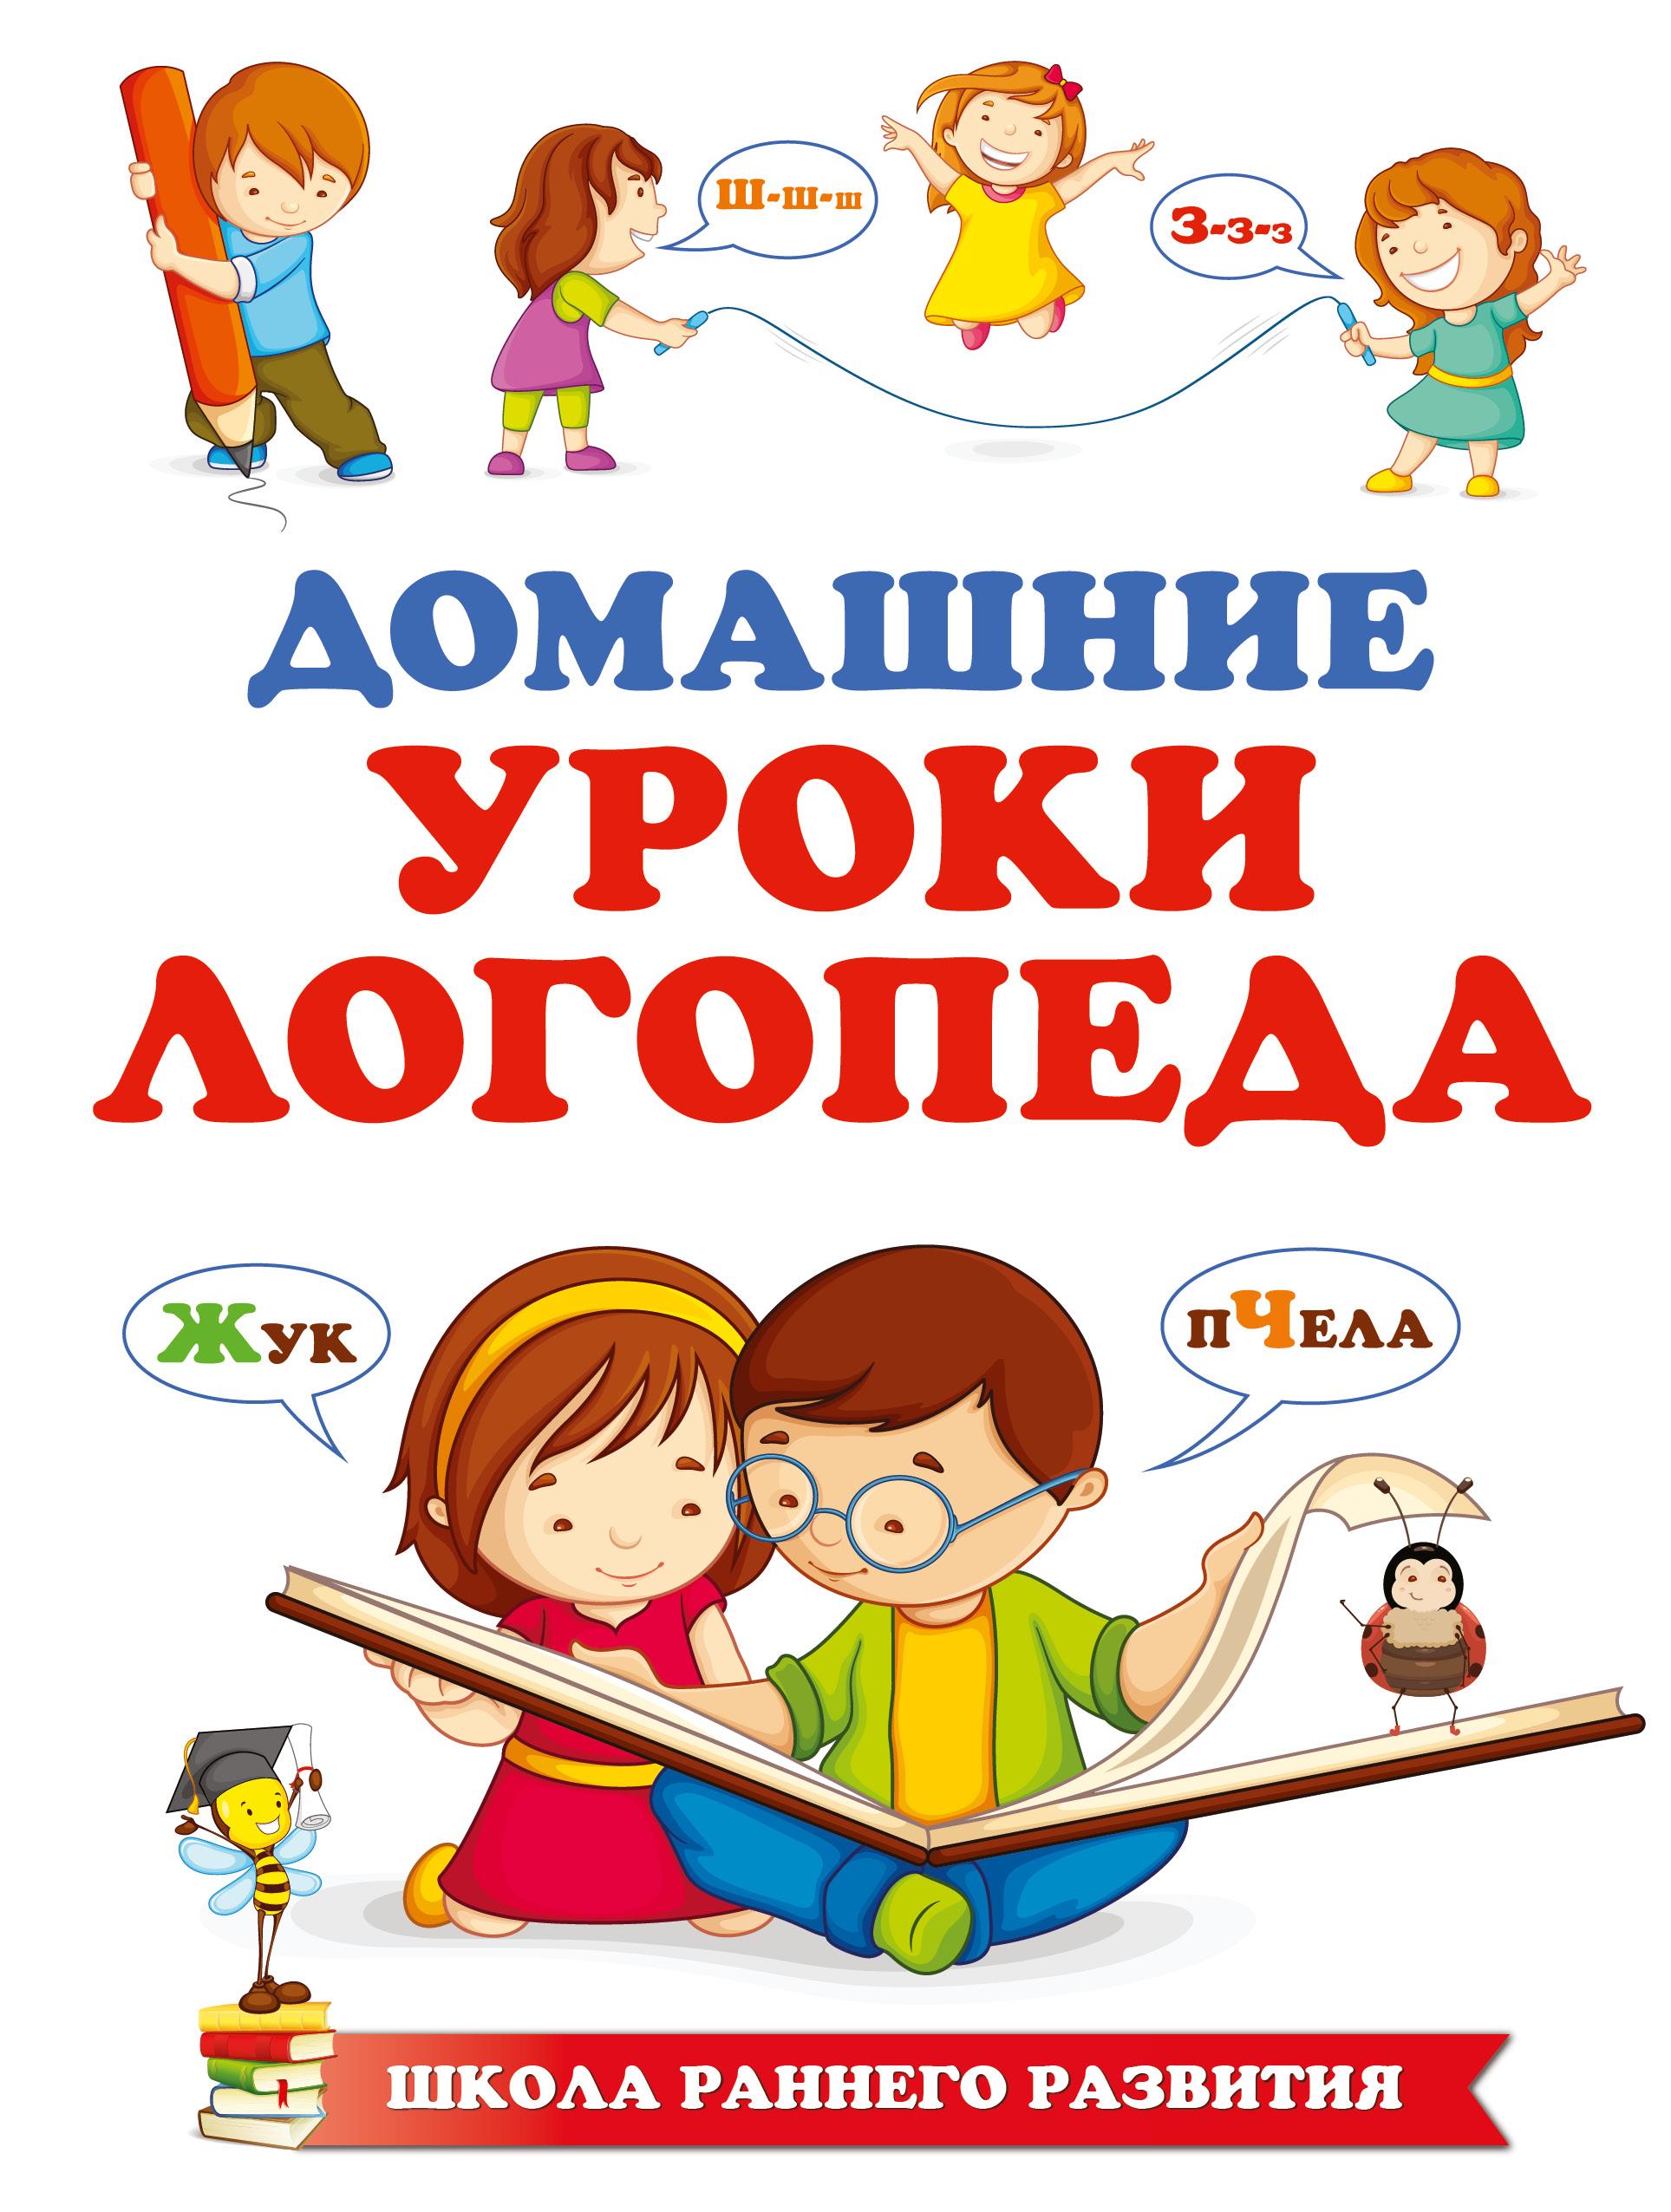 Новотворцева Н.В. Домашние уроки логопеда